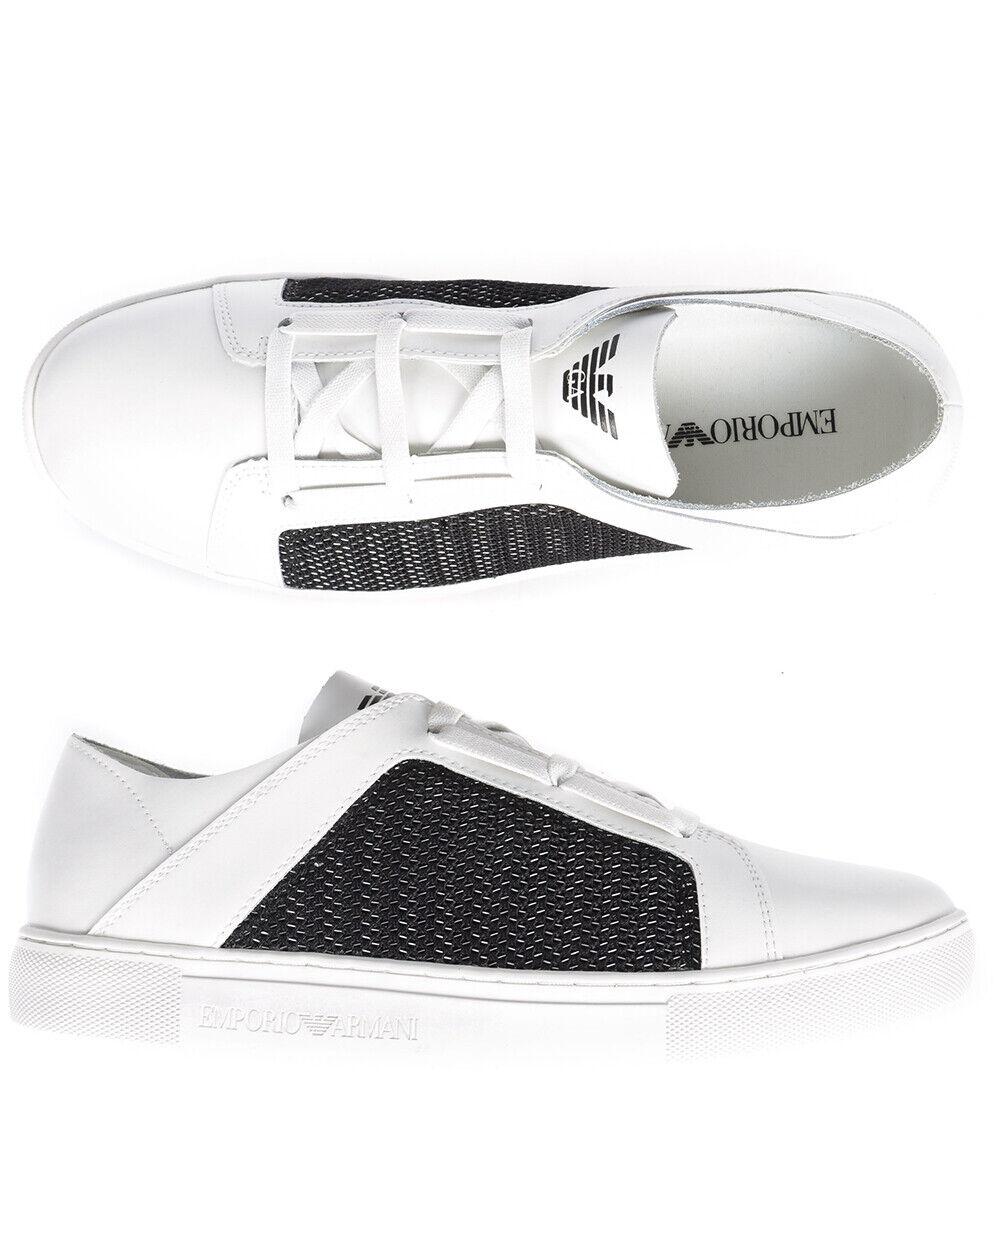 Emporio Armani Chaussures Baskets Cuir Homme Blanc X4C472XL205 A011 Sz41, 5 makeoffer